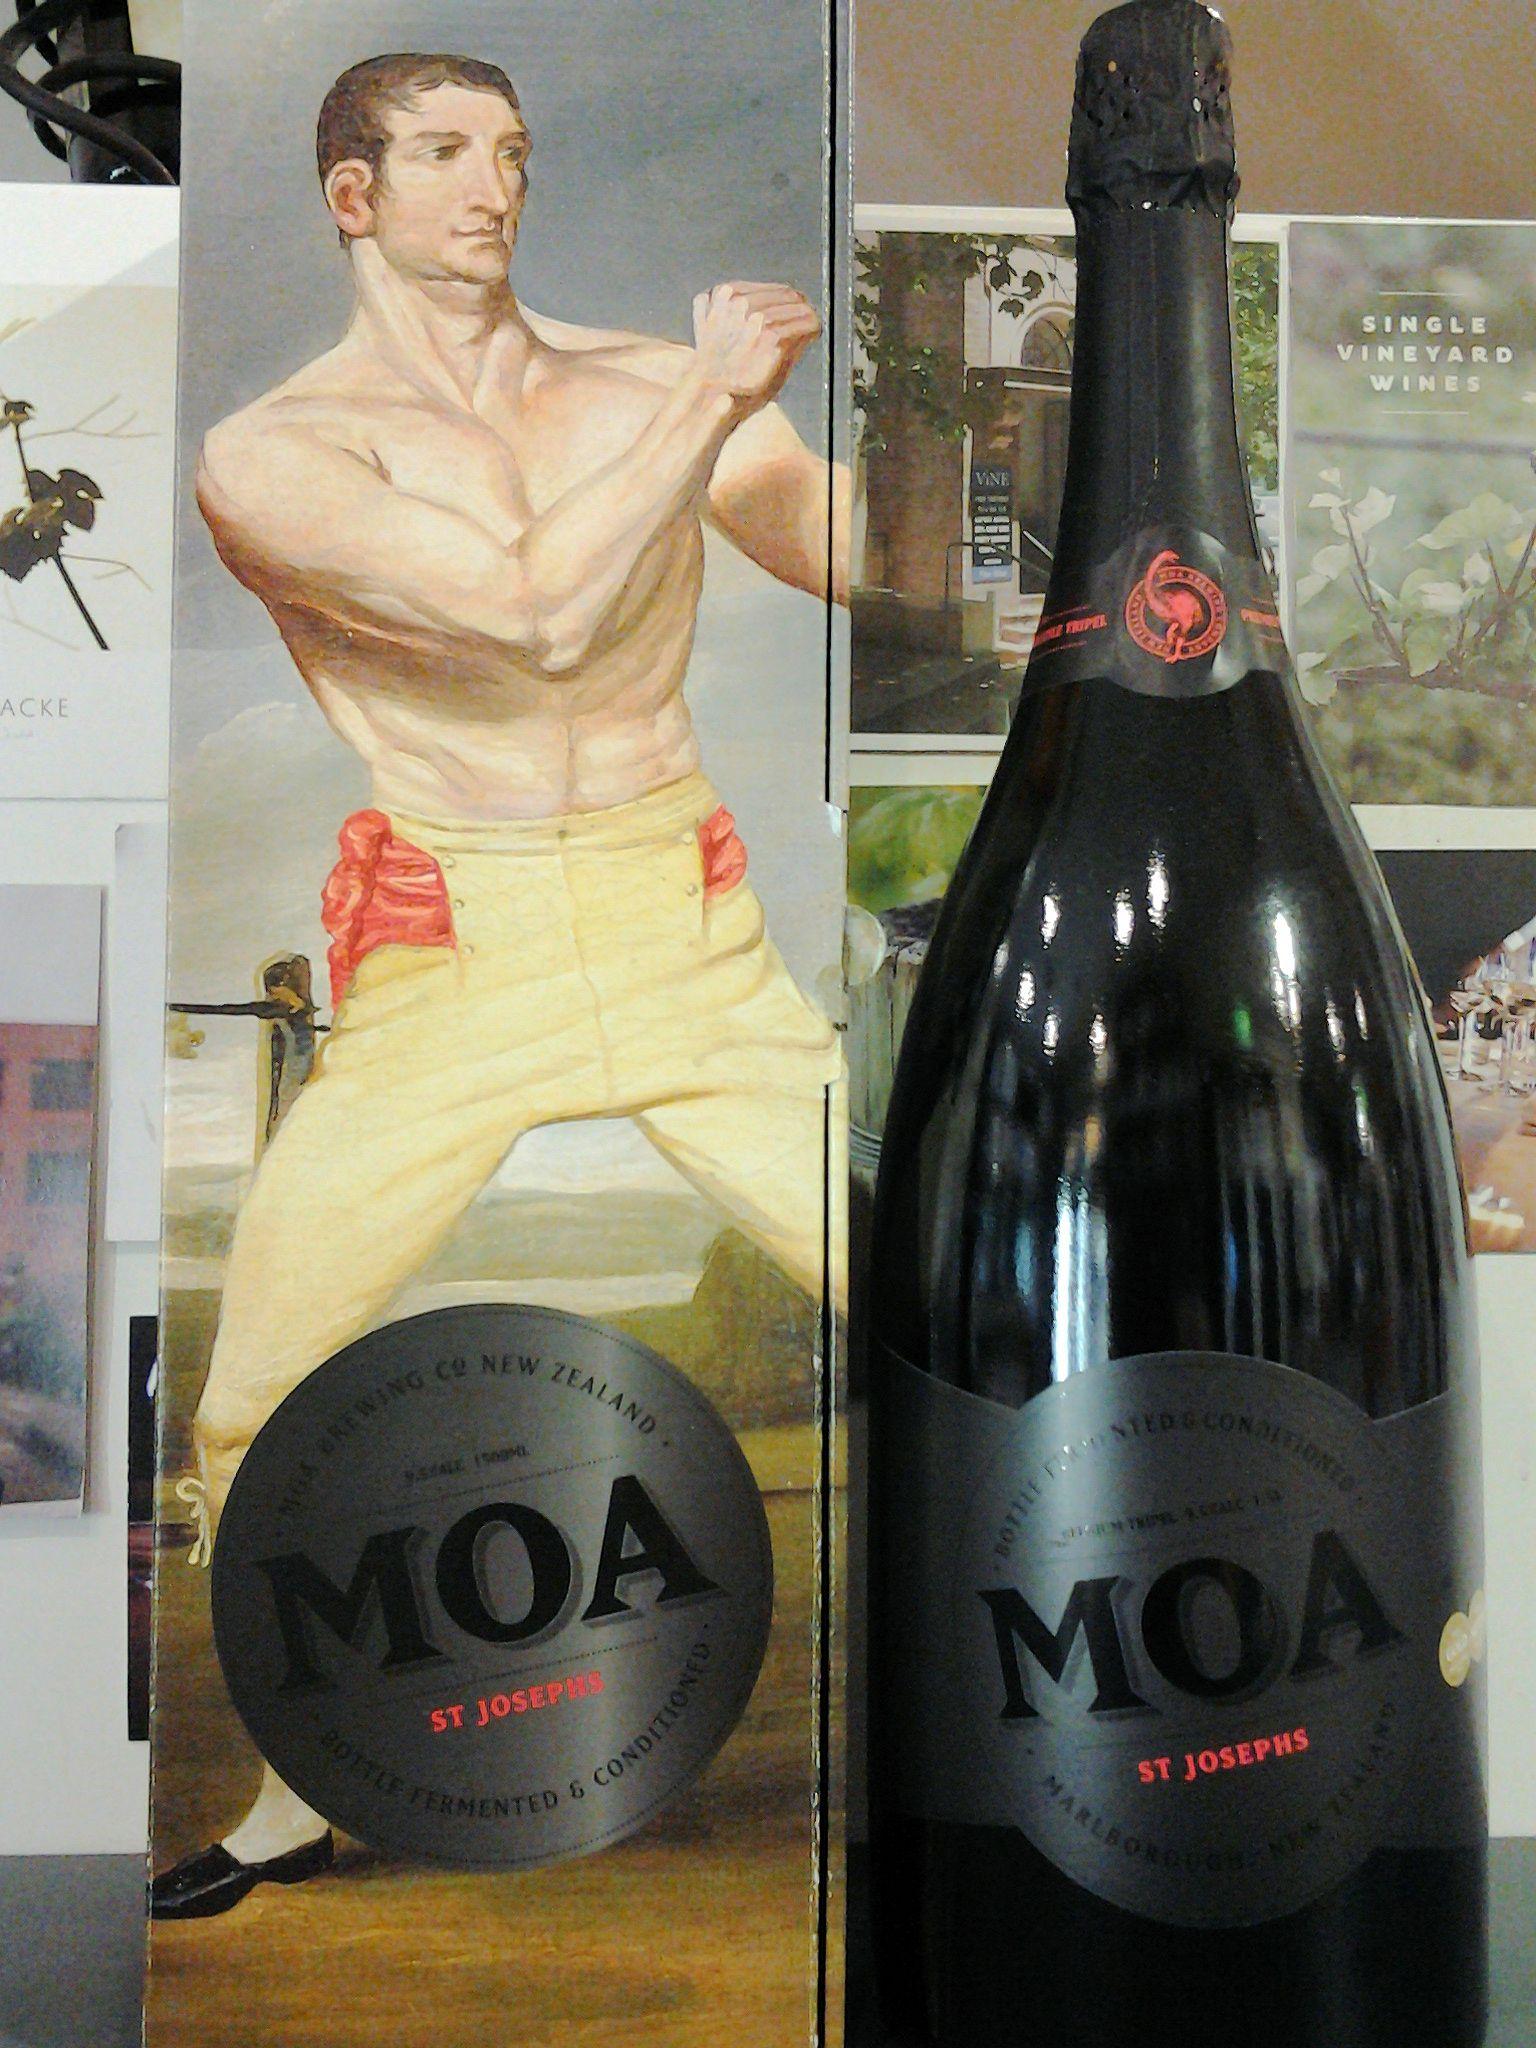 Win a Magnum of Moa St Joseph